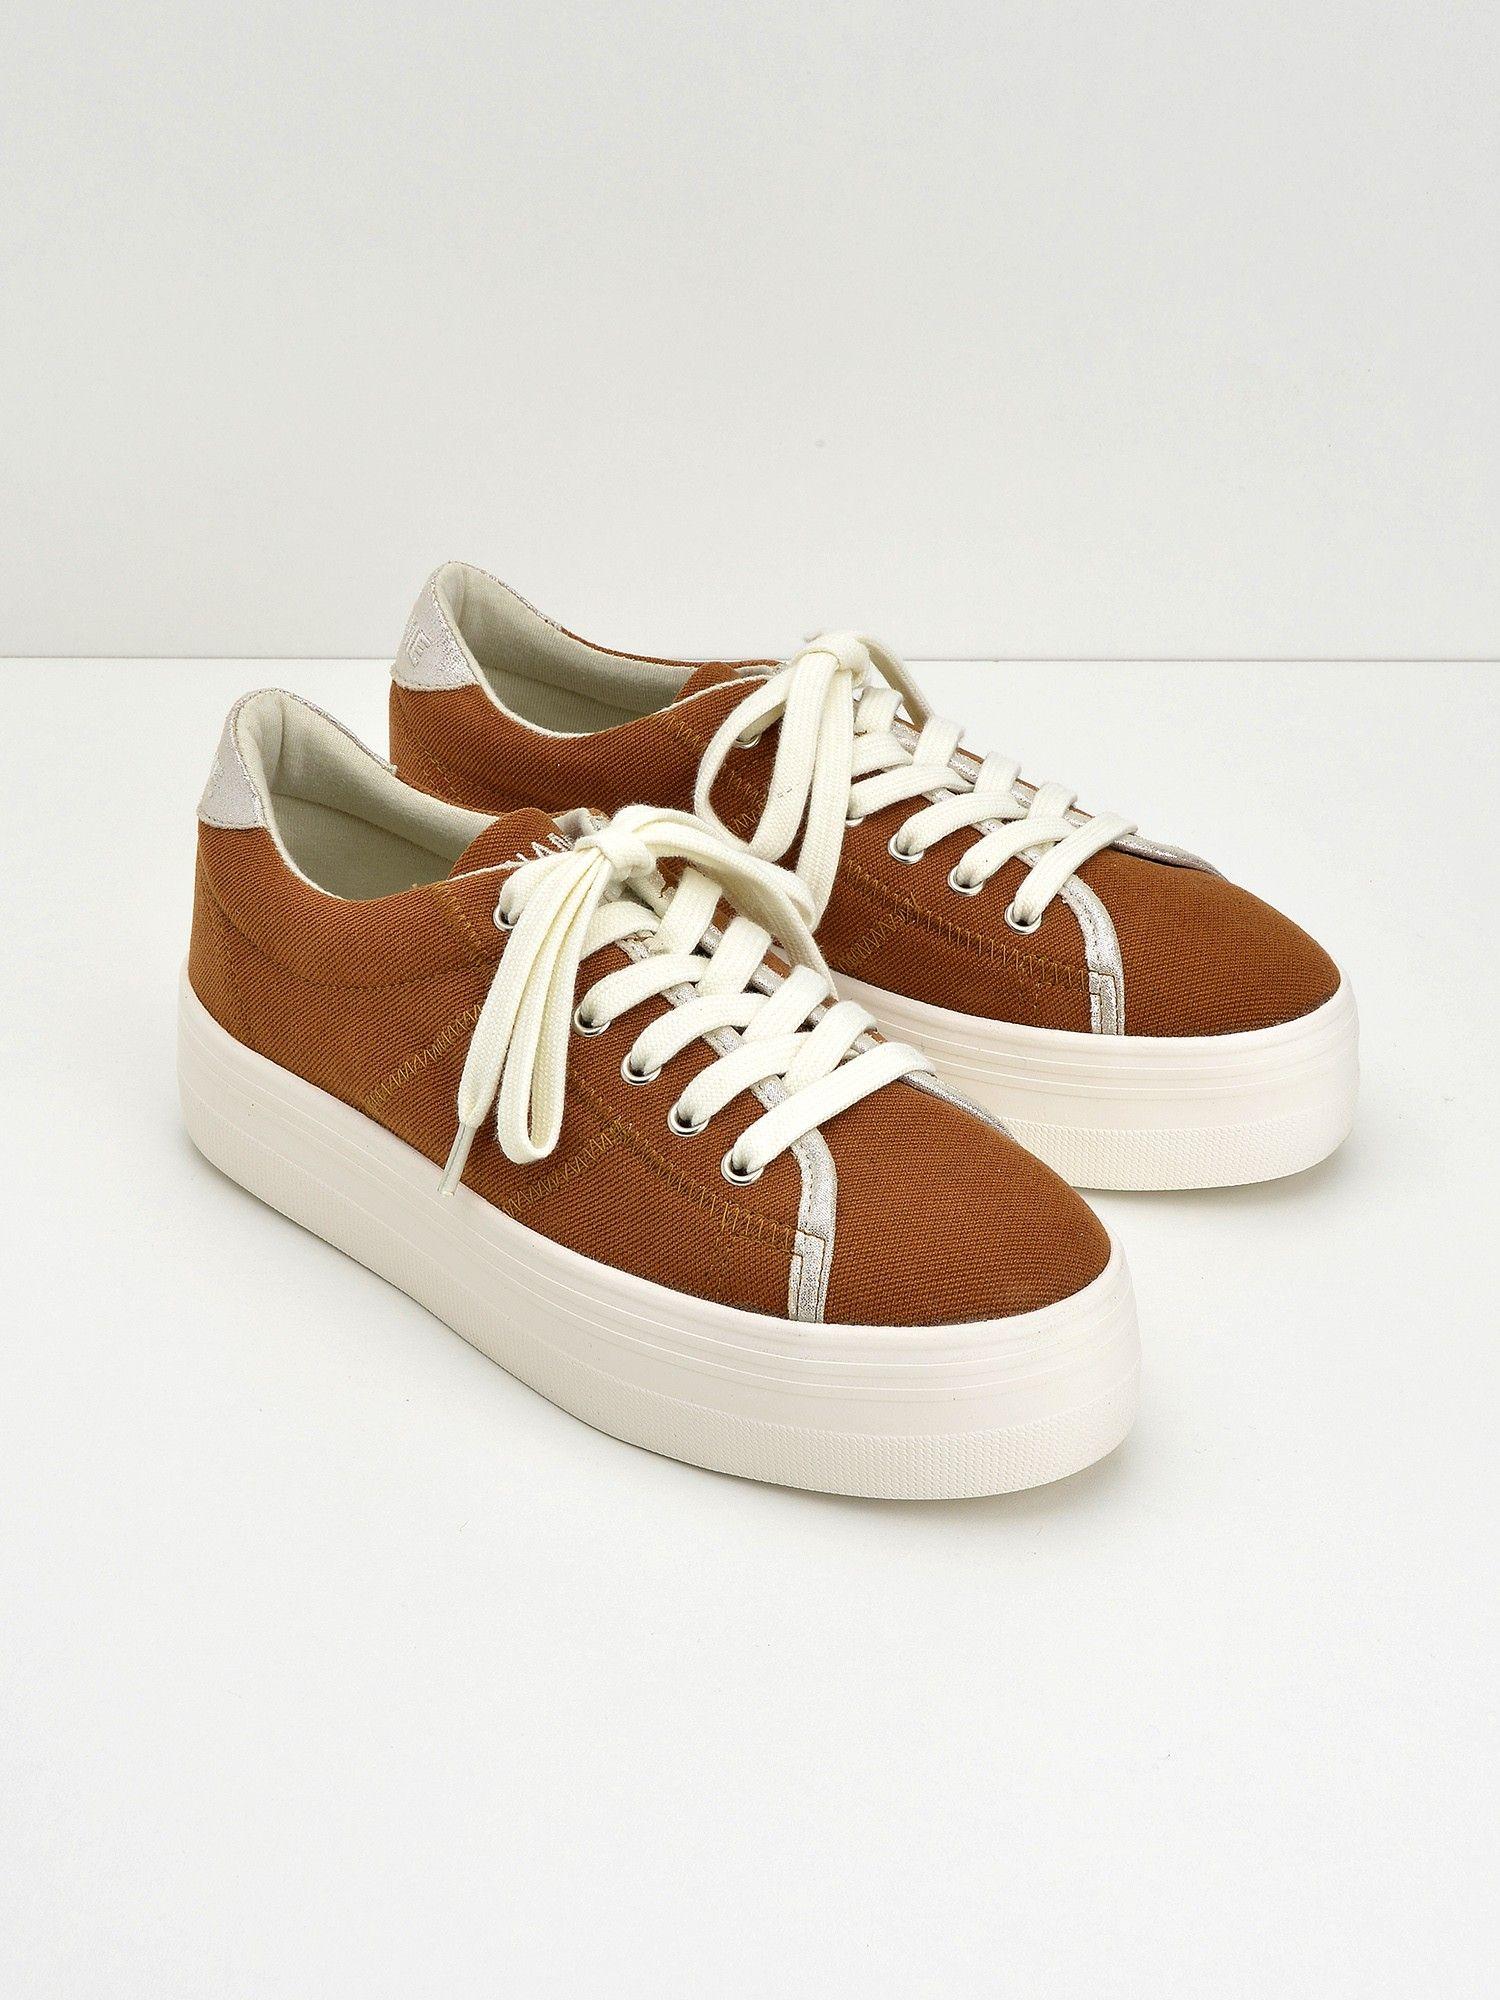 Name No Palavas Gingernonamesneakers Plato Sneaker cj3RqS4L5A